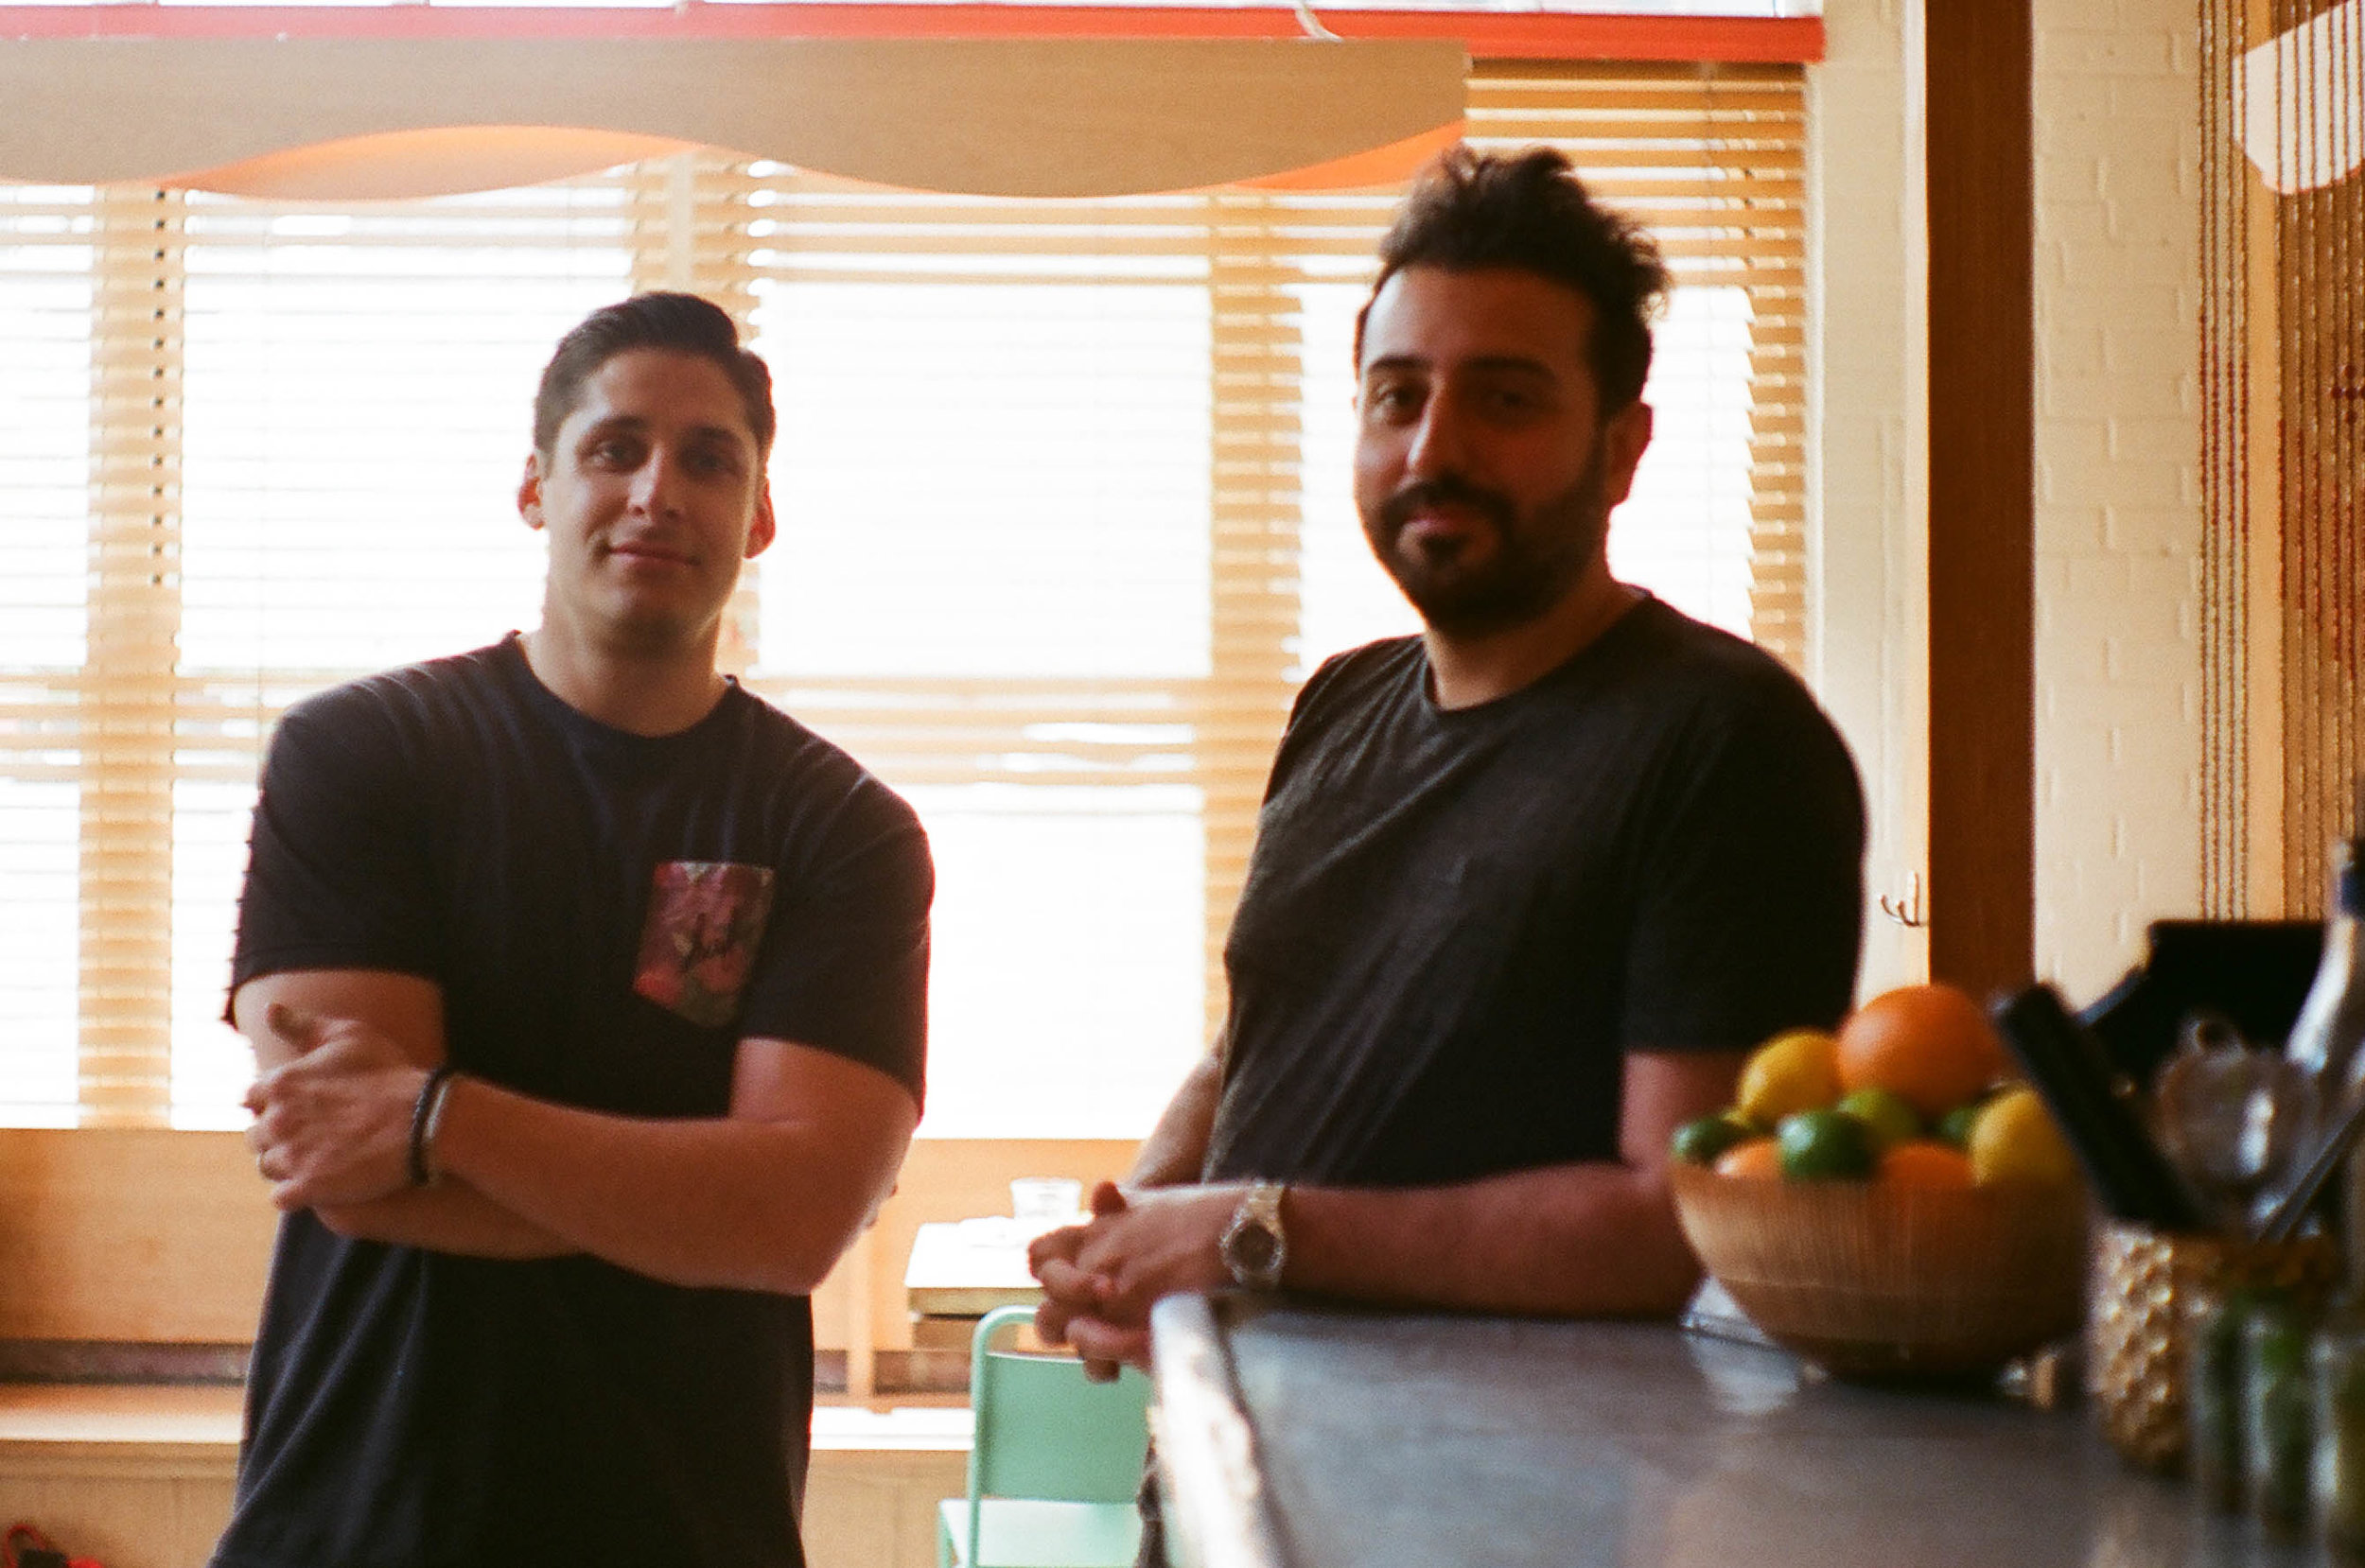 the owners, Koorosh Bakhtiar & Nima Garos